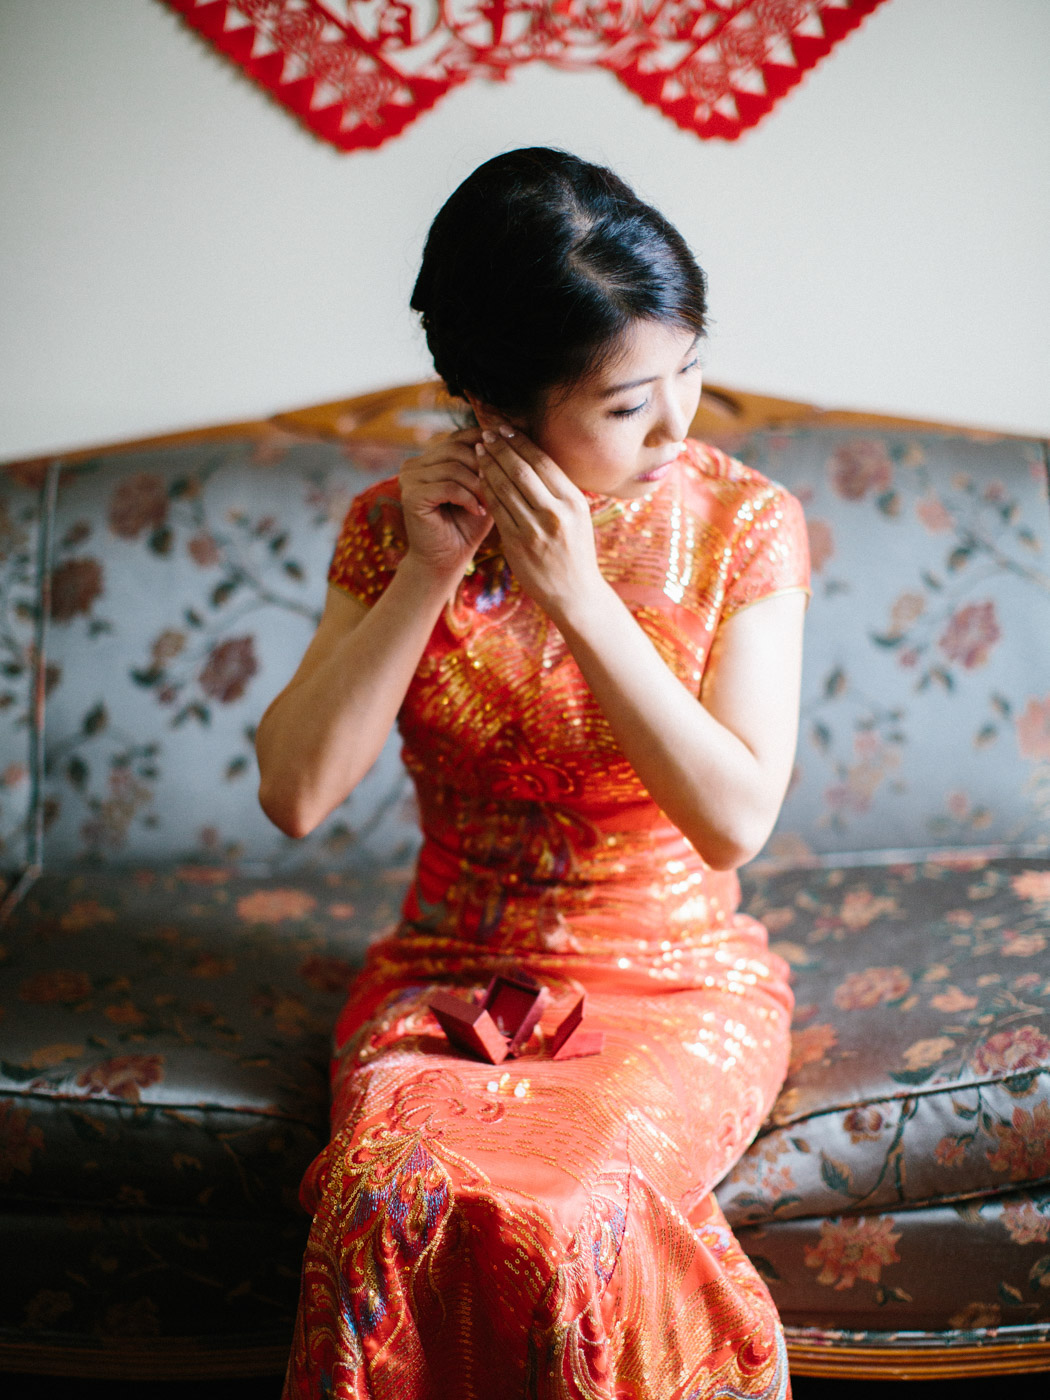 toronto_wedding_photographer_fine_art_documentary_photography-44.jpg